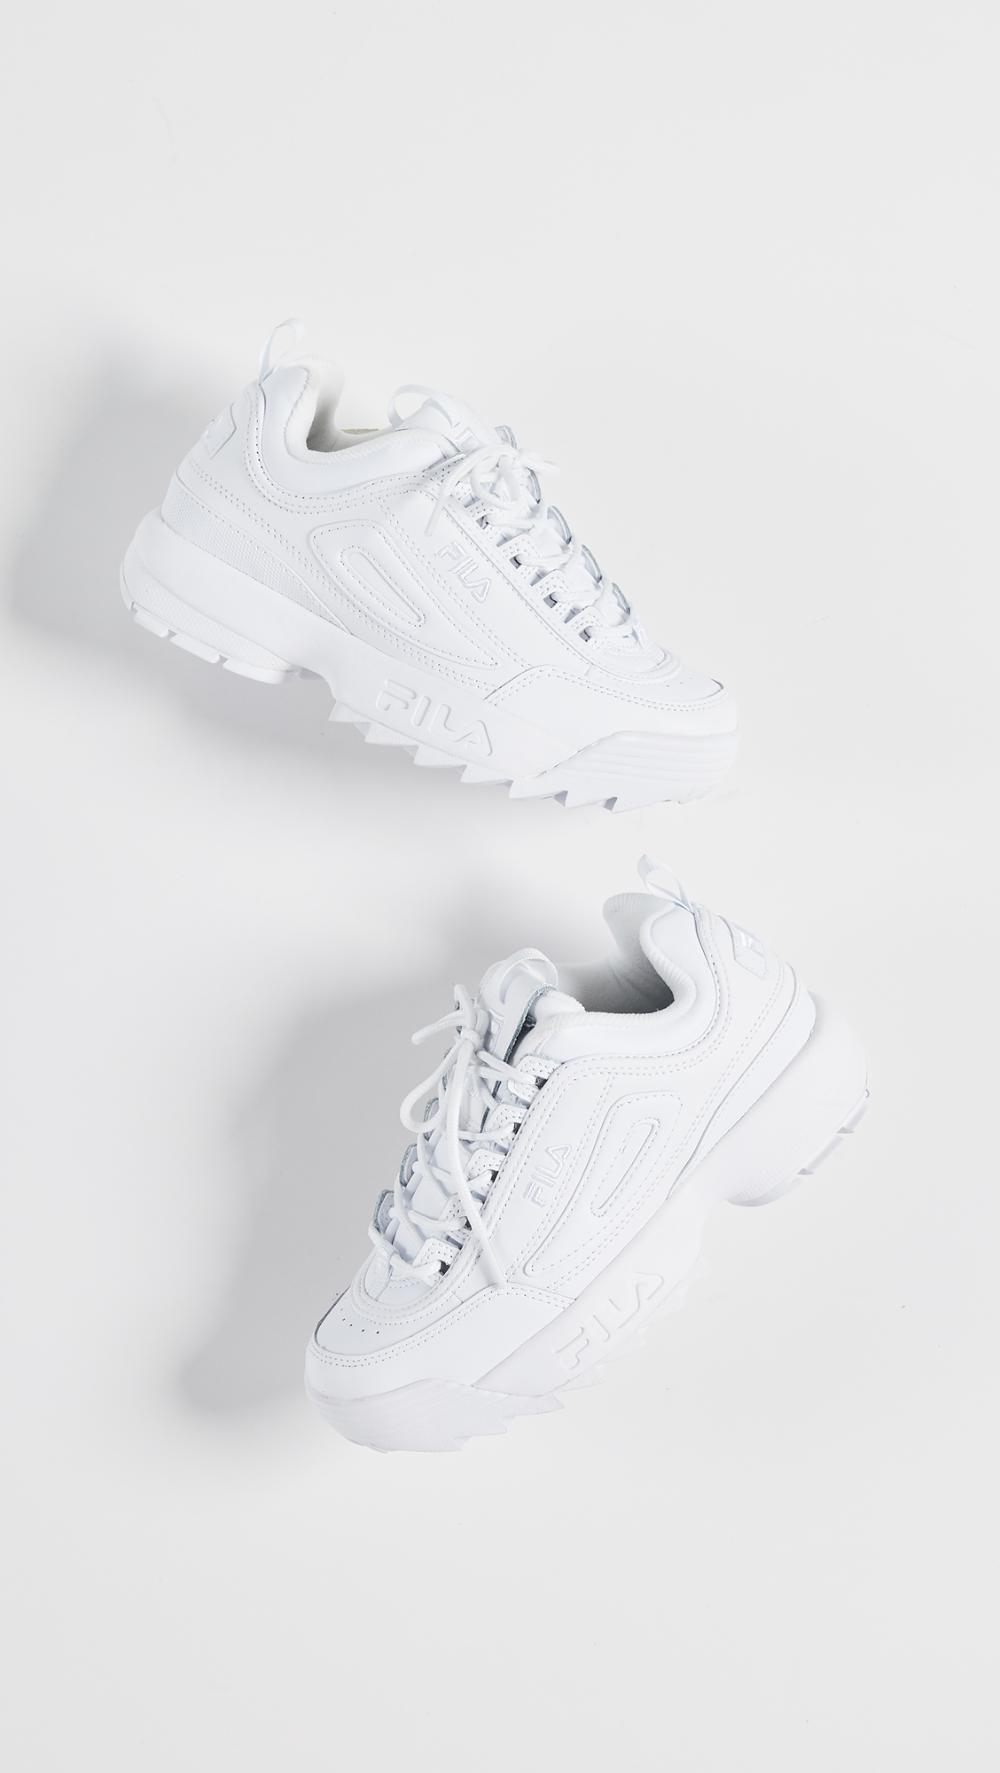 Fila Disruptor II Premium Sneakers